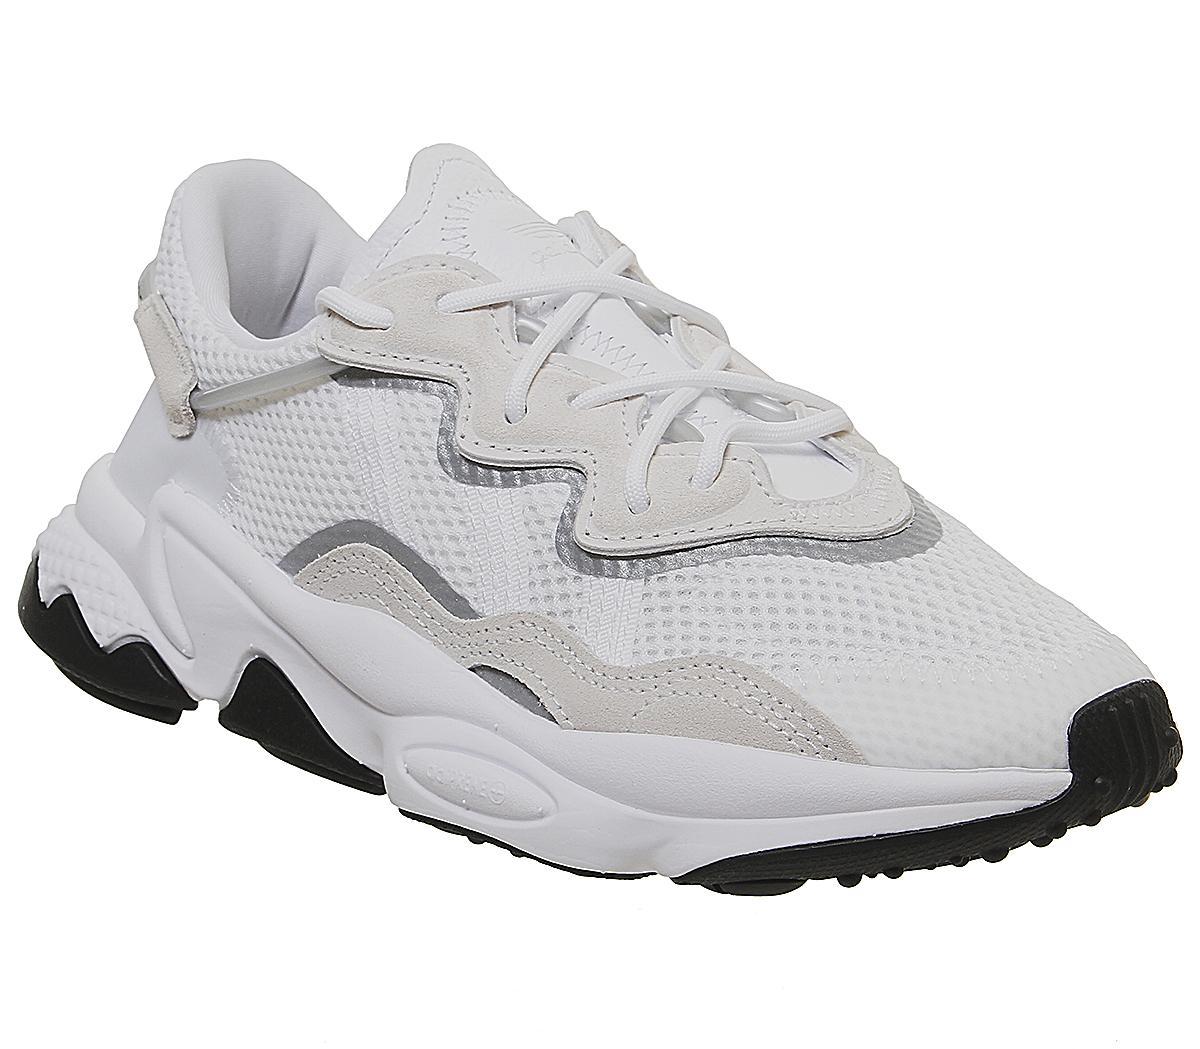 adidas Ozweego Jnr Trainers White White